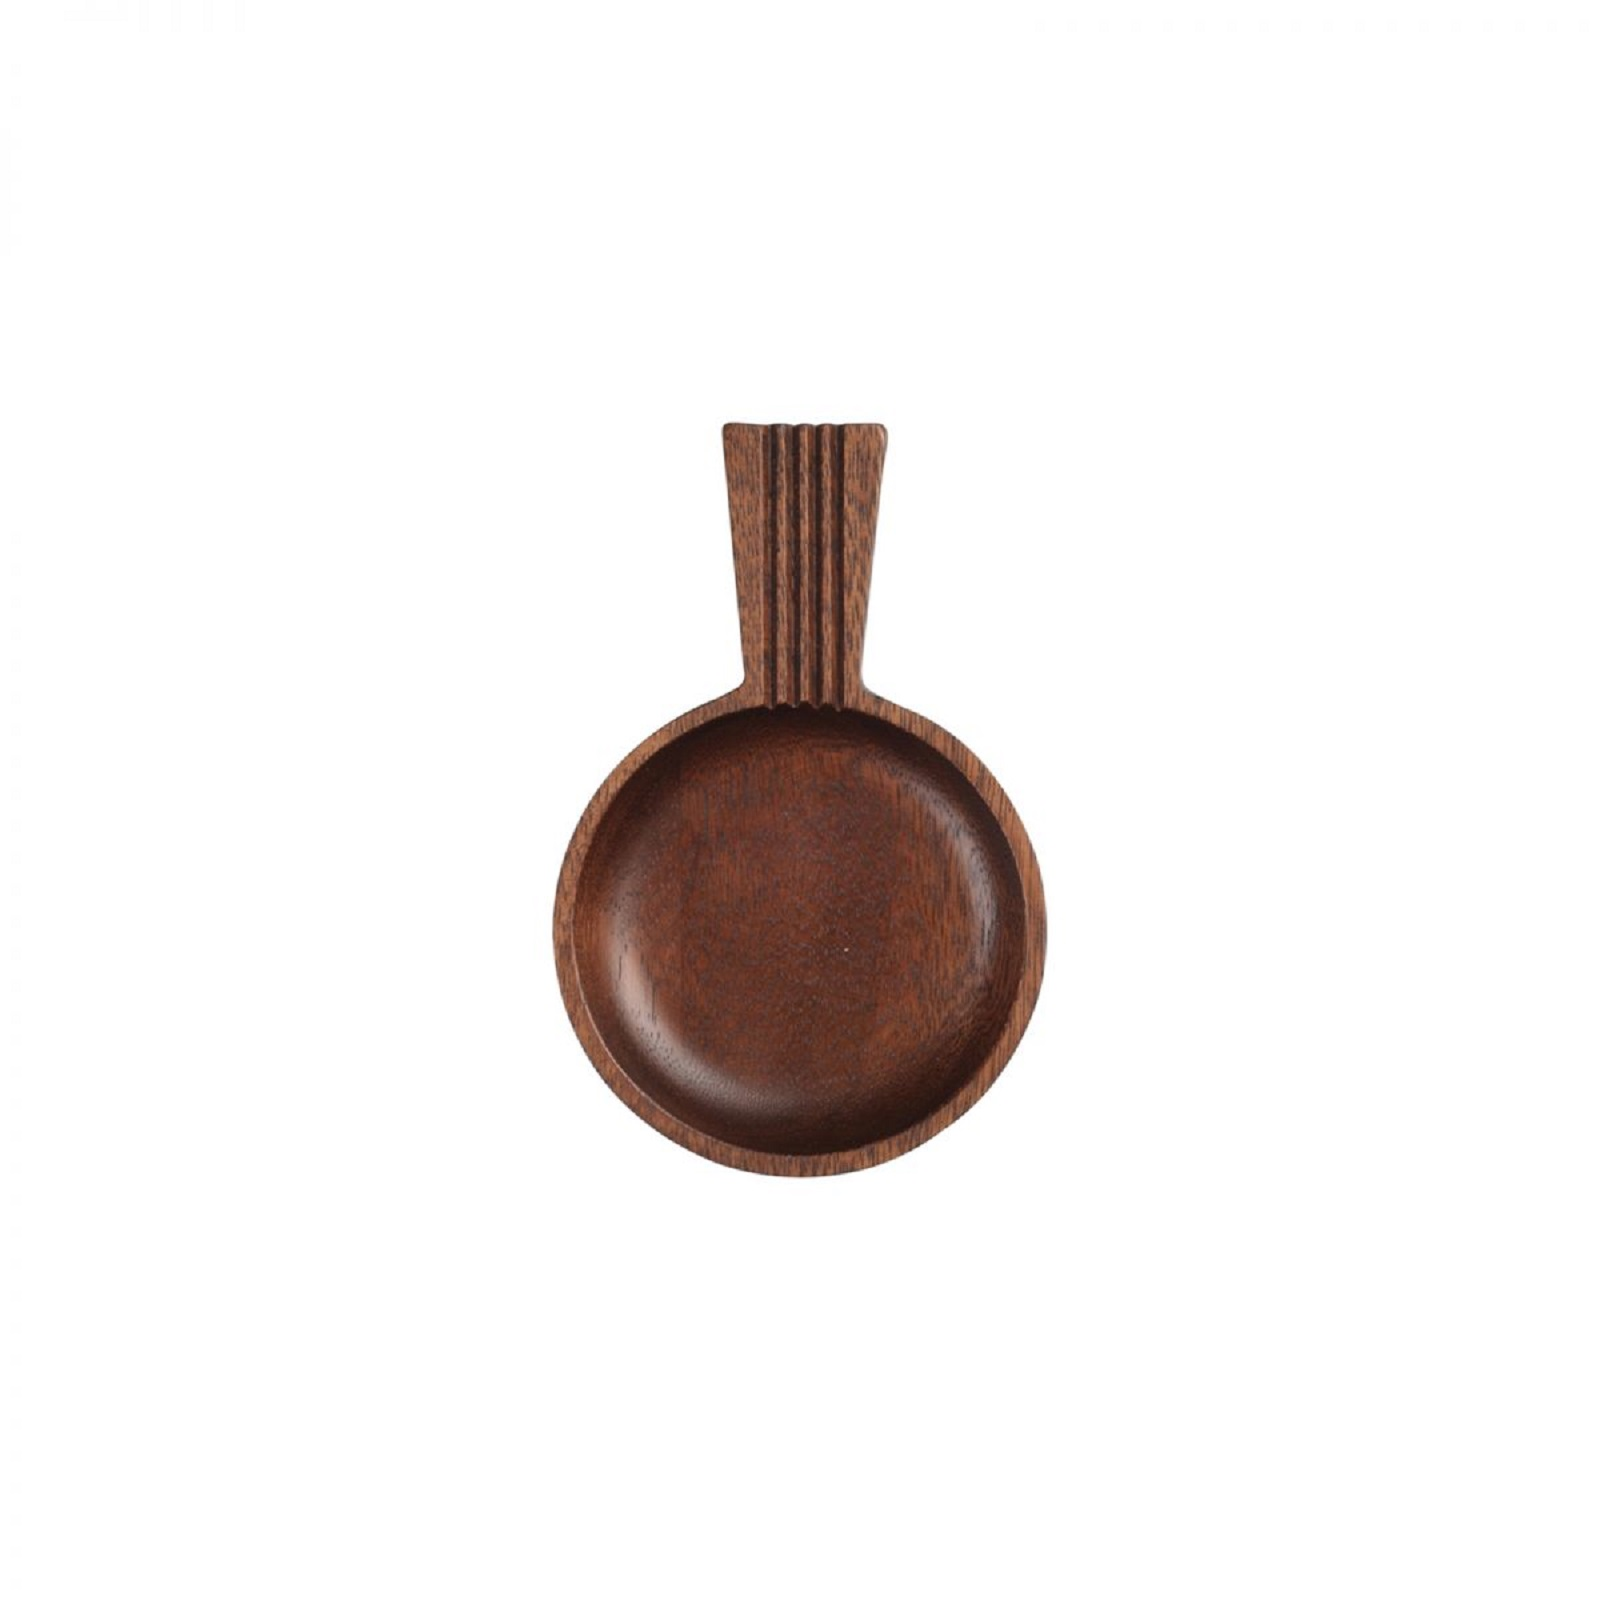 Онлайн каталог PROMENU: Блюдо для закусок деревянное T&G DECO, 12х18 см, коричневый T&G 09302